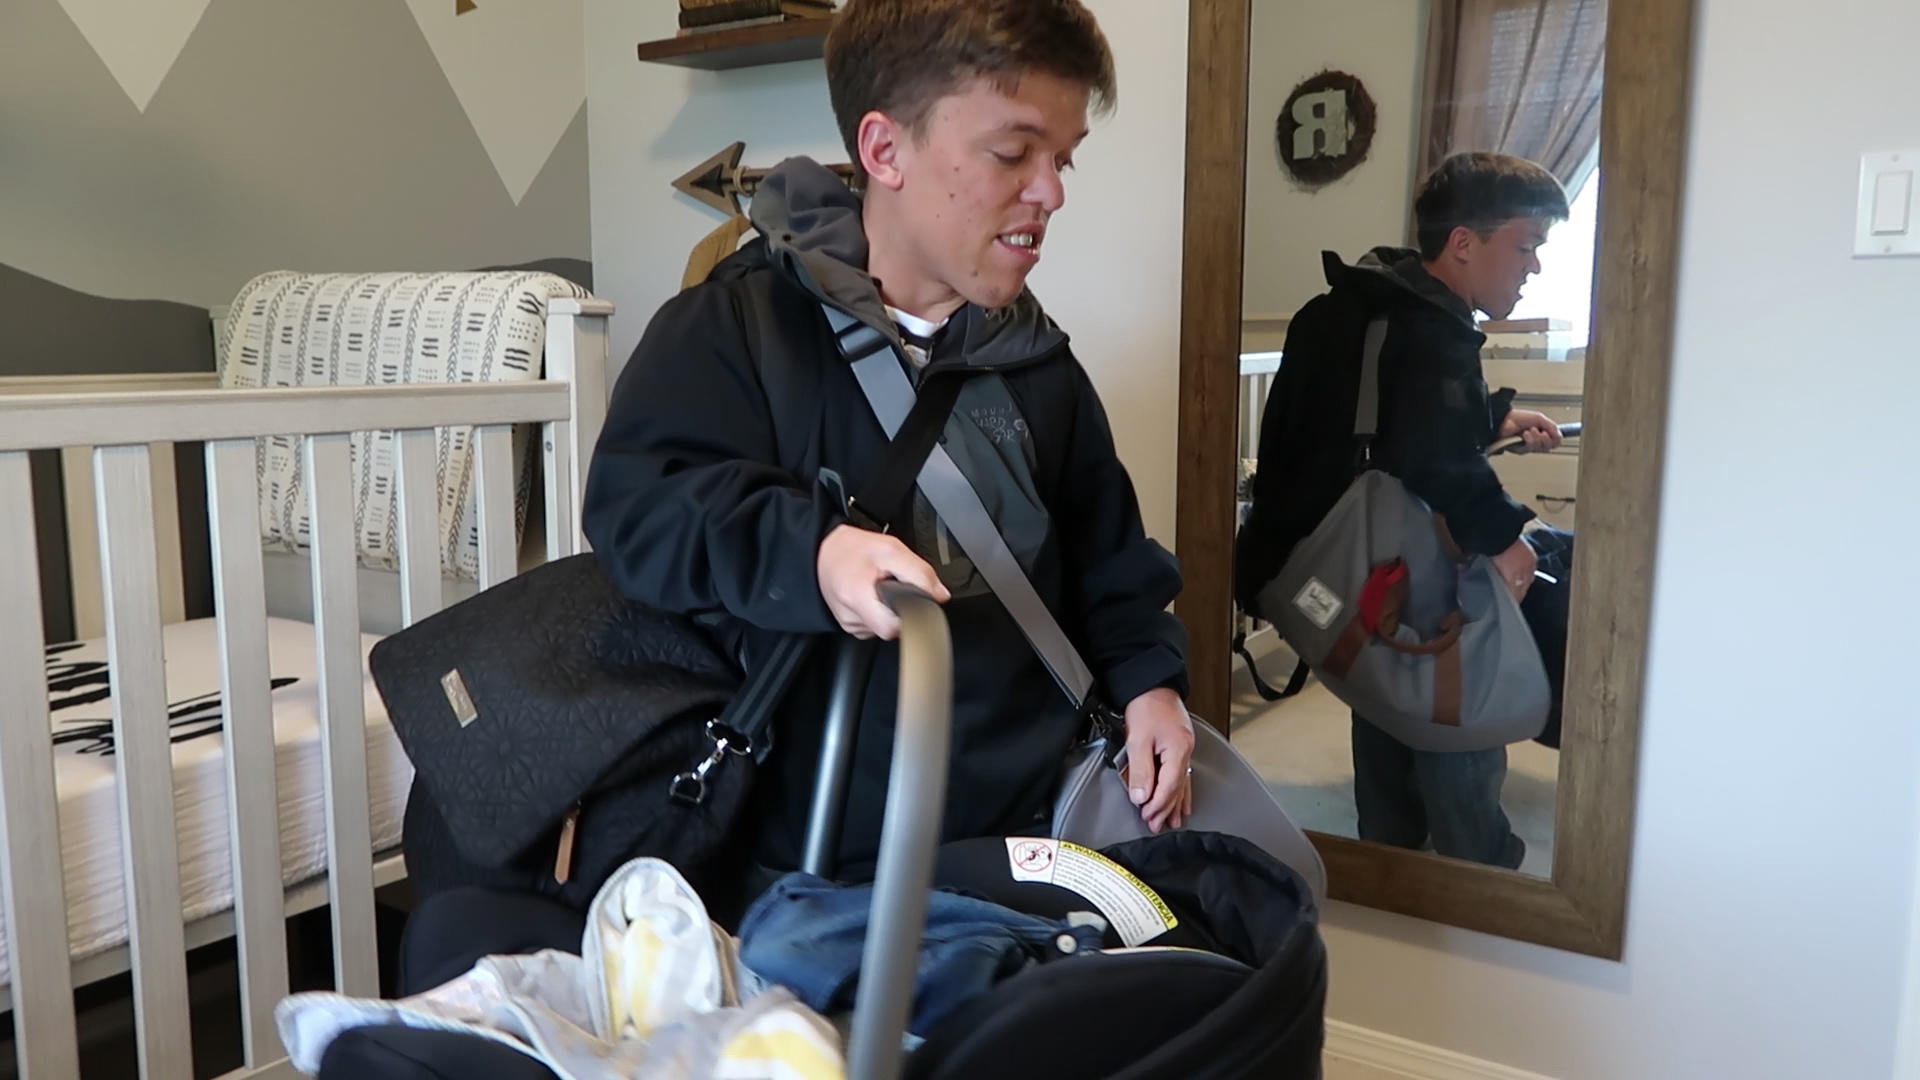 Zach and tori roloff prepare for birth tlcme tlc for Is zach roloff s baby a little person